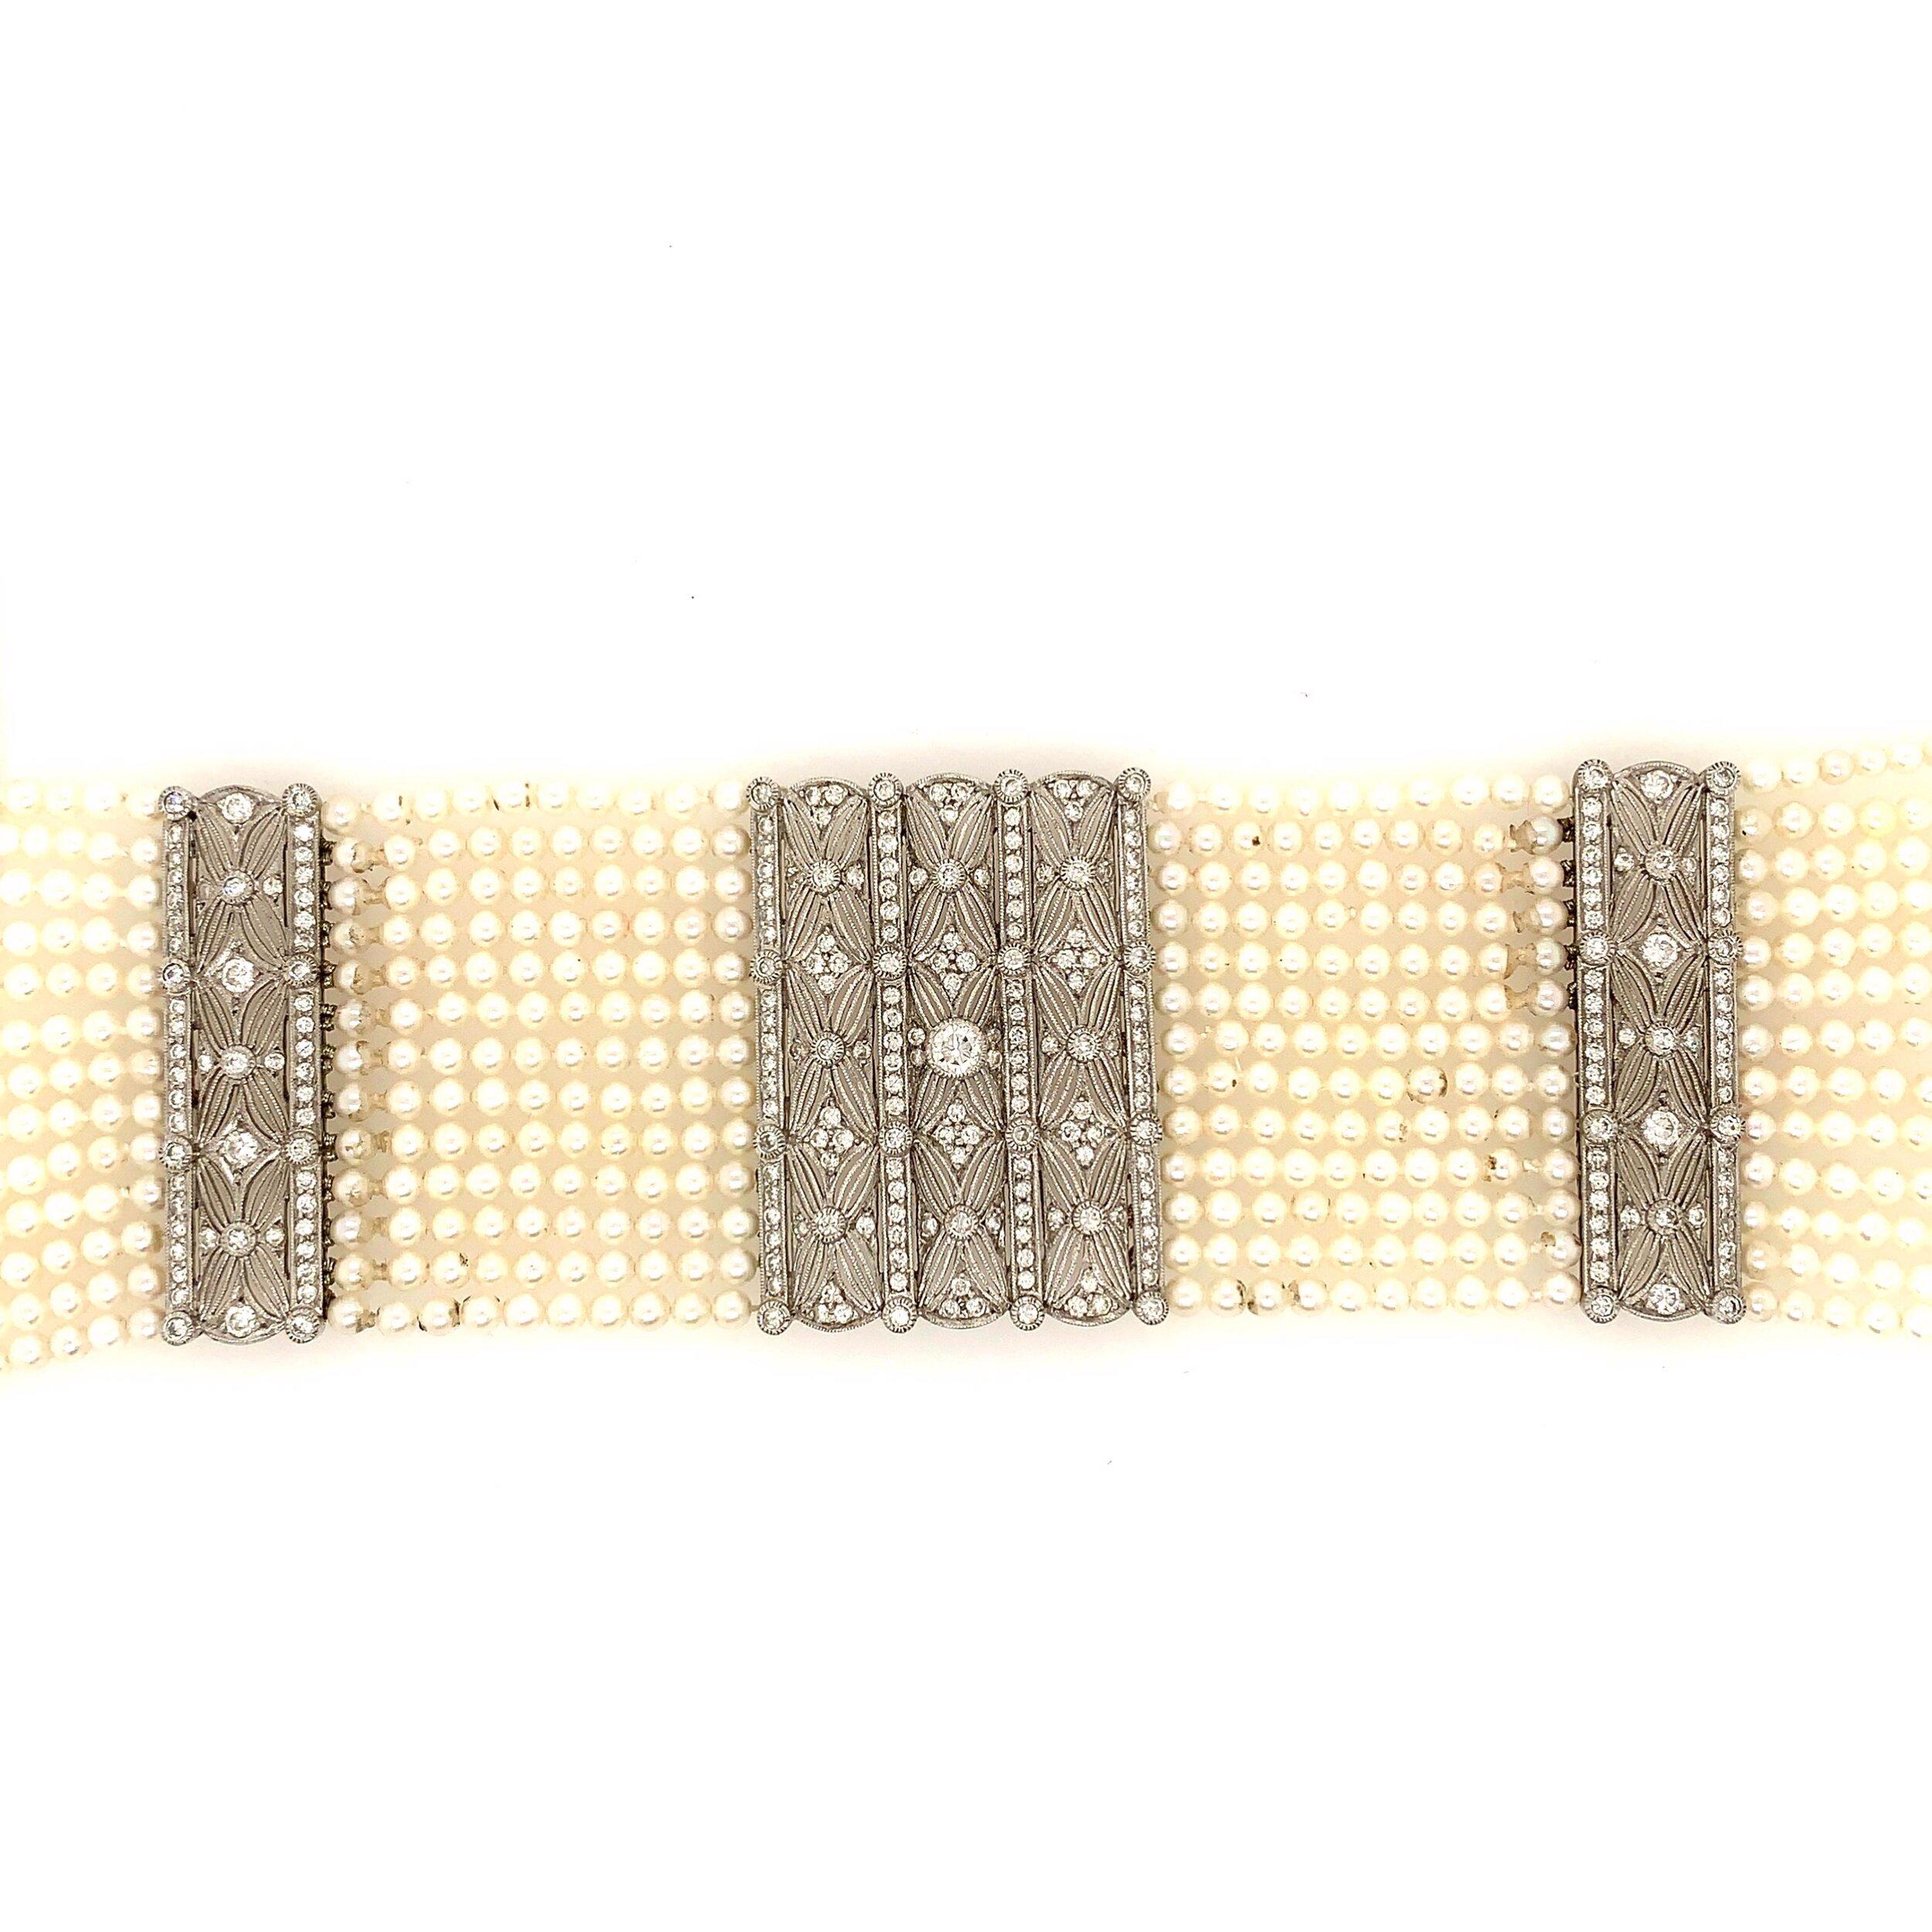 Vintage Multi-Strand Cultured Pearl Choker with Diamonds   Est. US$ 5,000-7,000